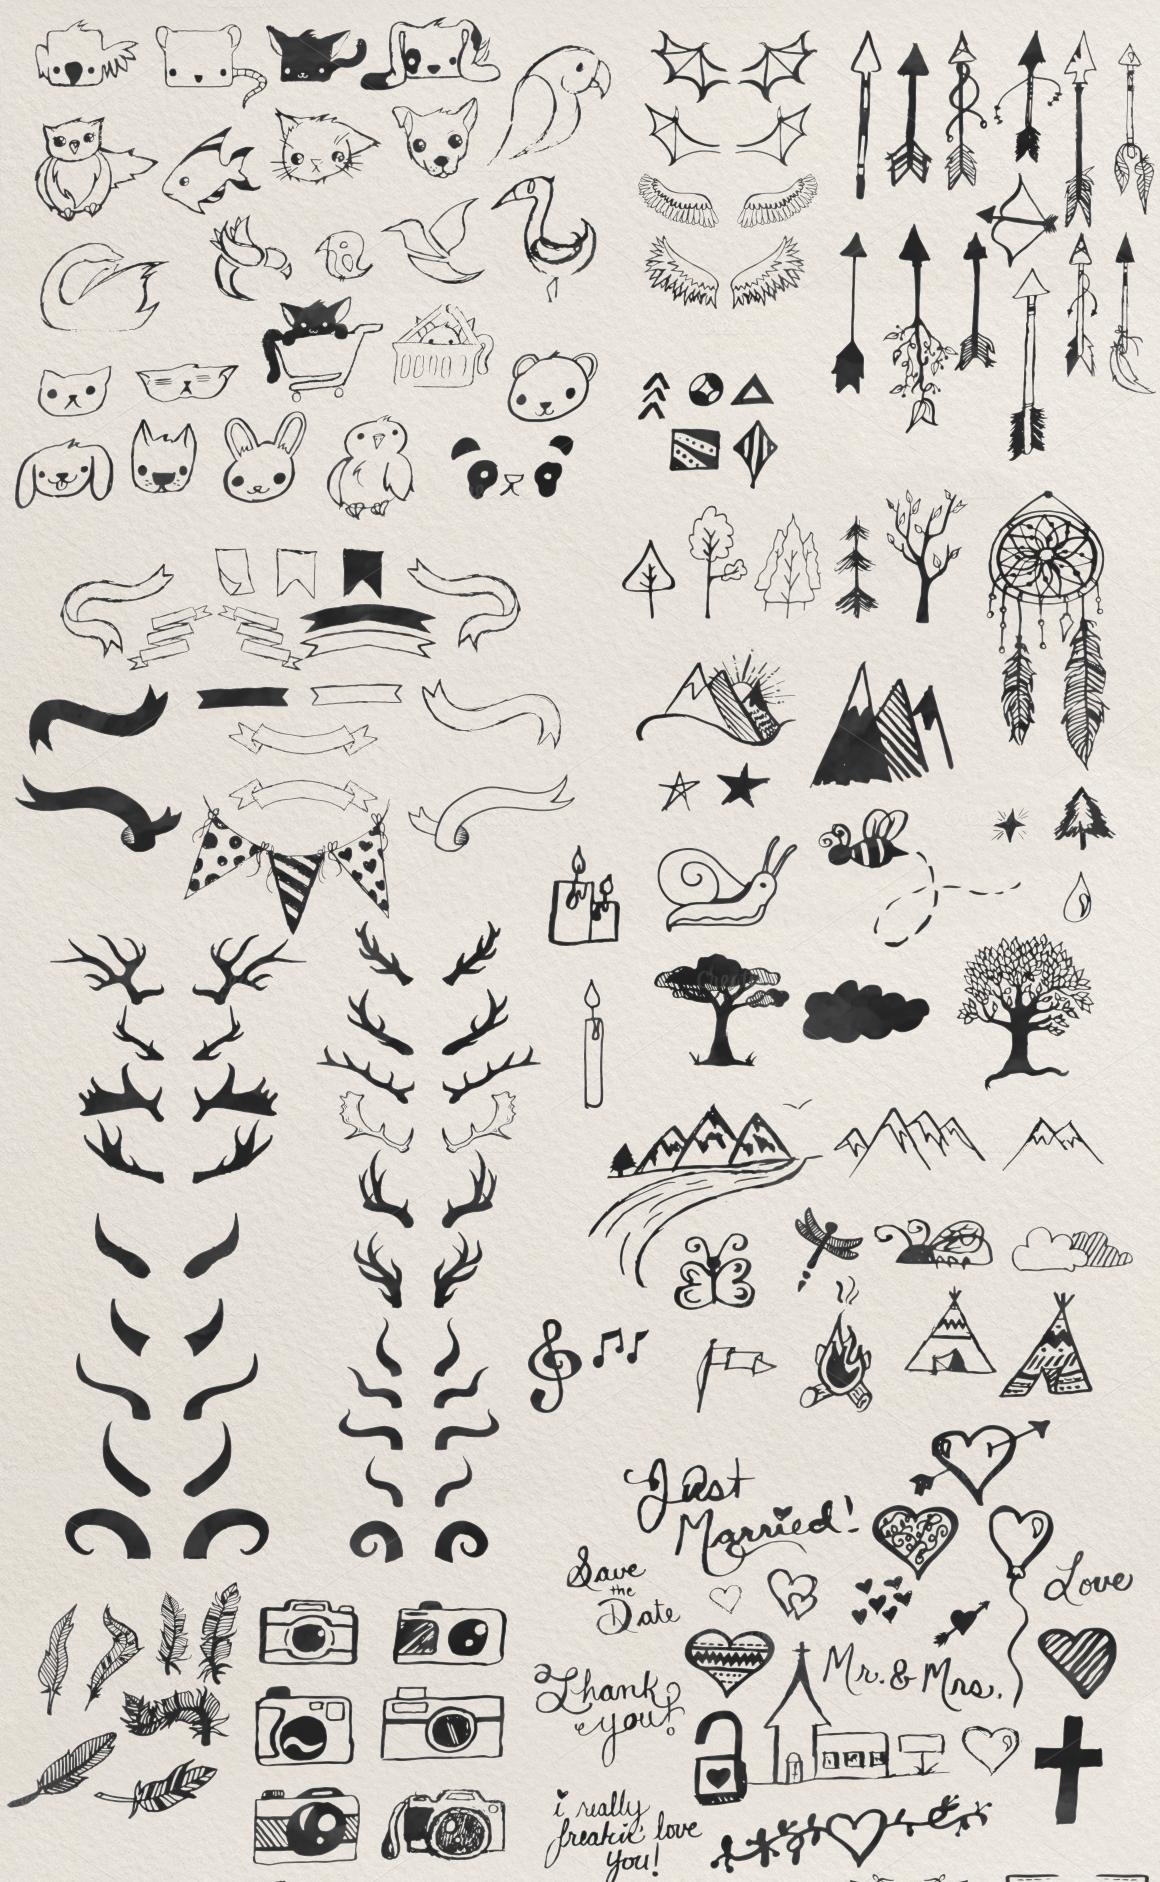 The Freakin' Big Illustration Pack by Brandi Lea Designs